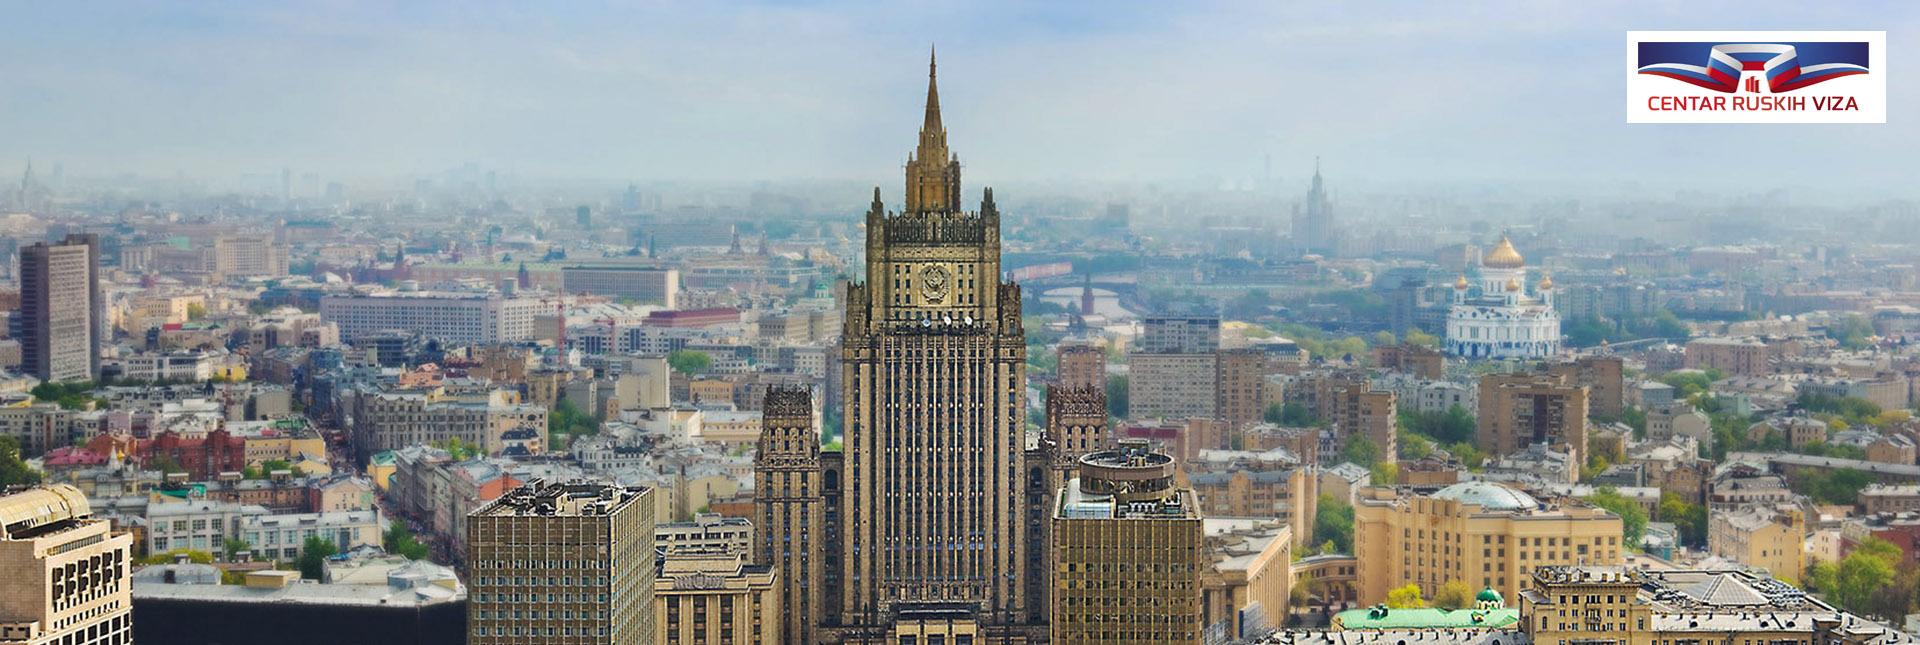 Centar Ruskih Viza New City Company Iteccion Pancevo